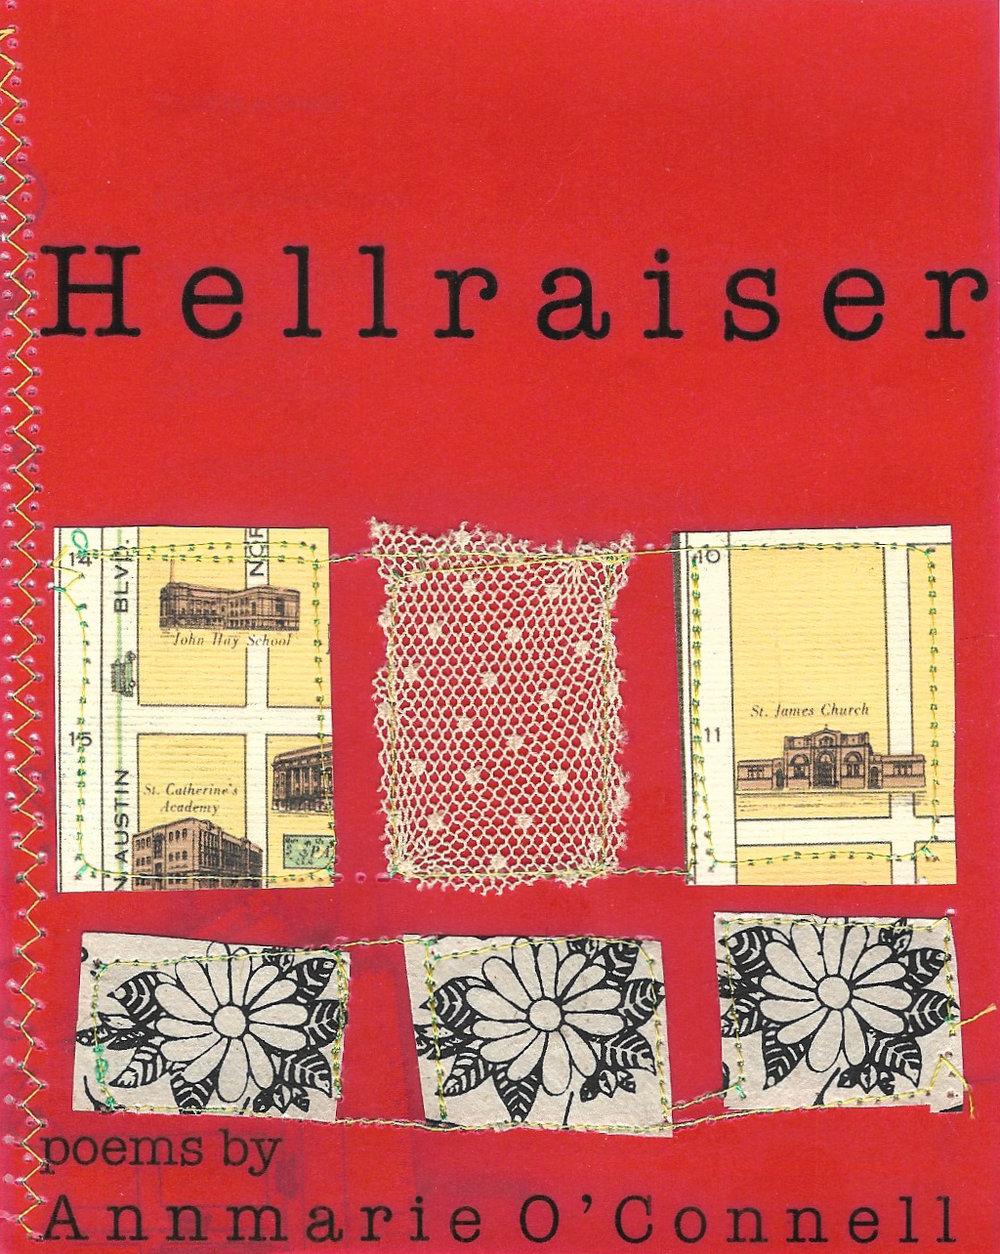 hellraiser website 1.jpg